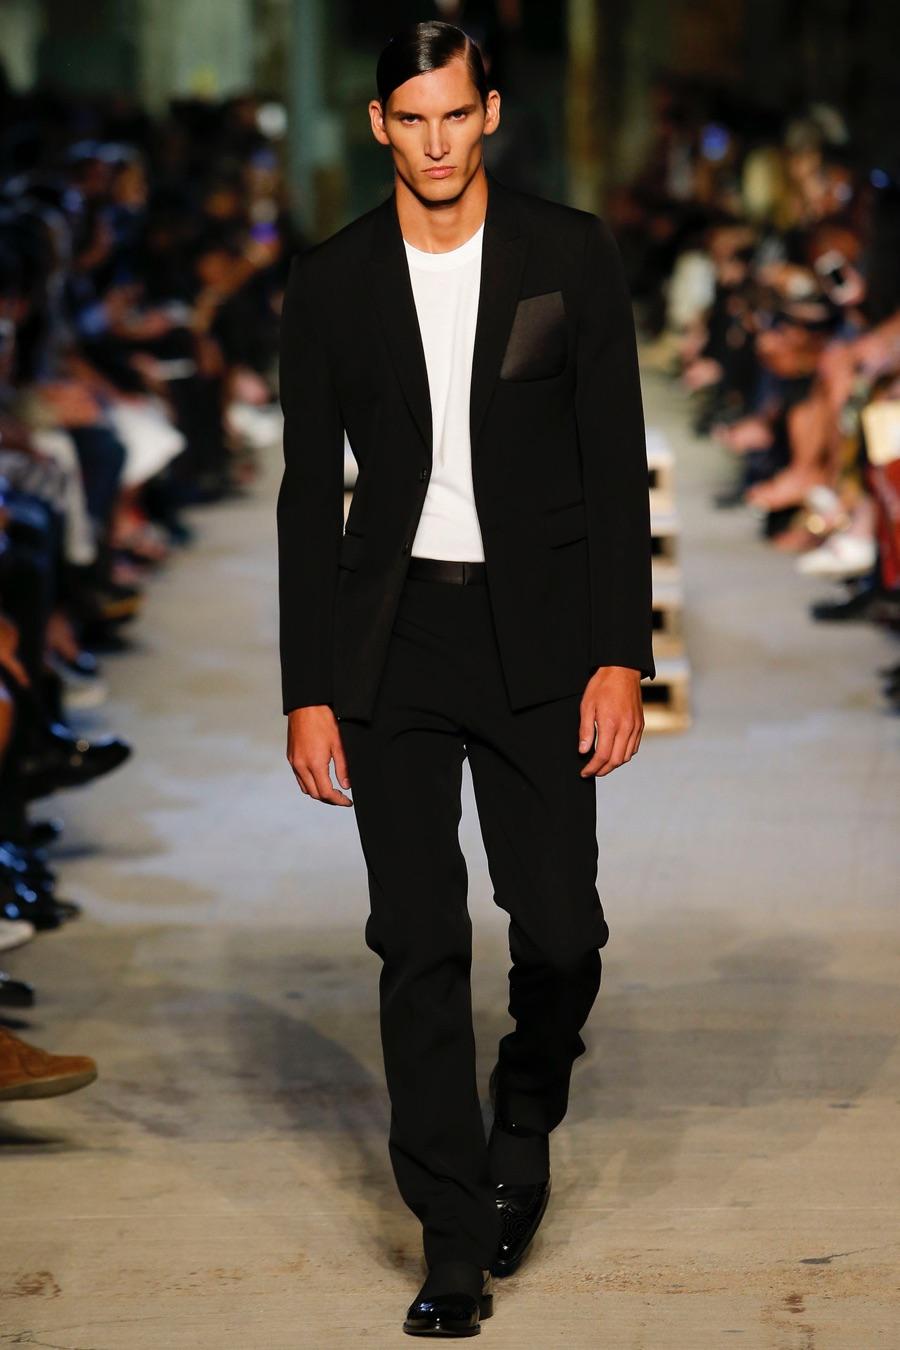 Givenchy-Spring-Summer-2016-Menswear-Collection-New-York-Fashion-Week-011.jpg